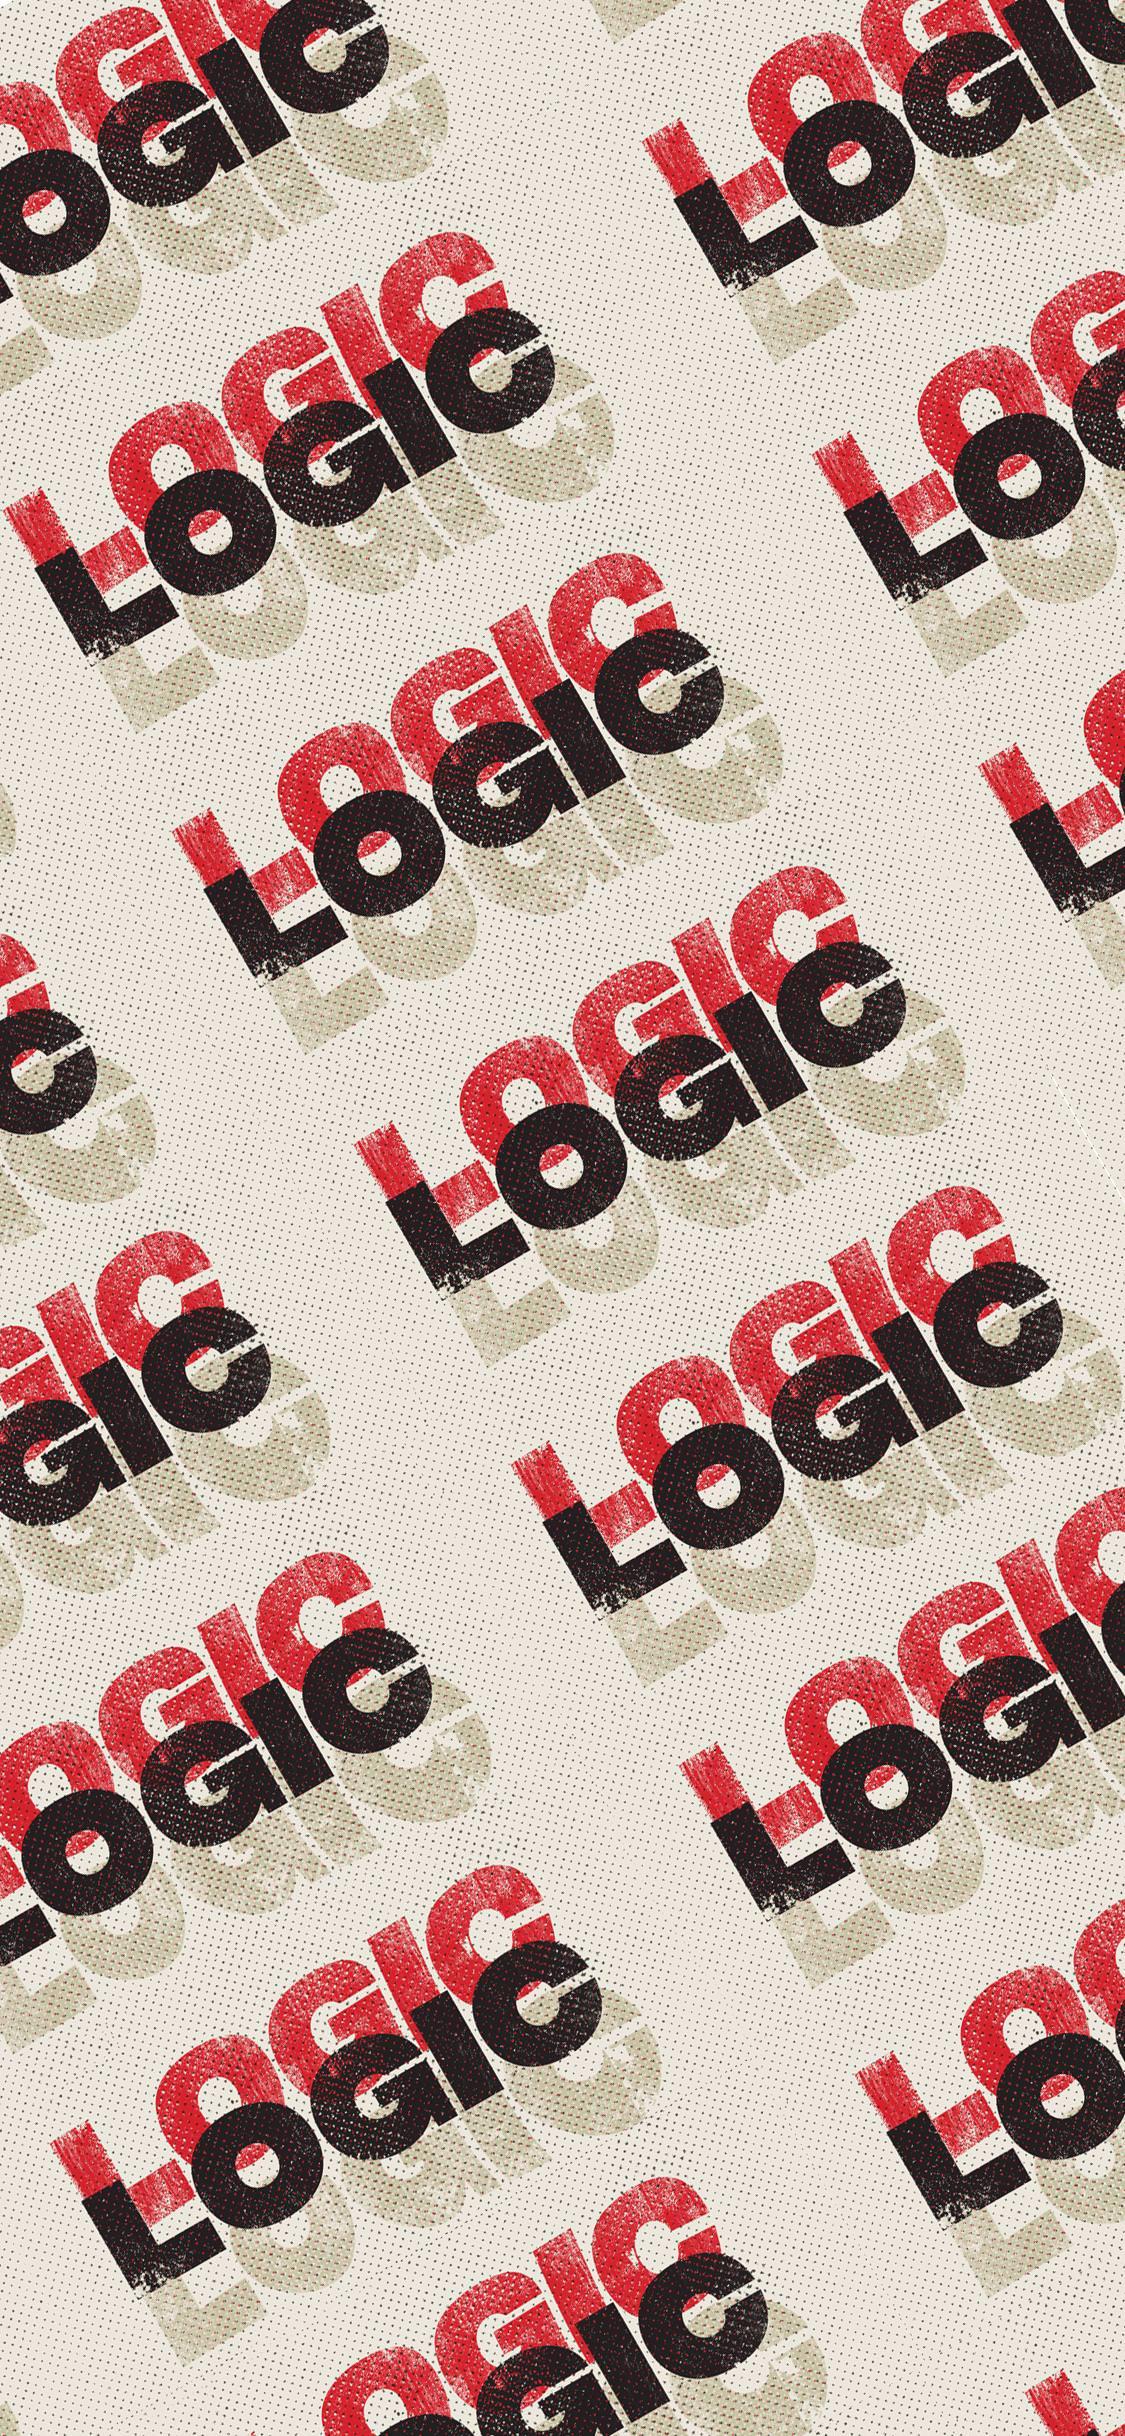 Logic Wallpapers - Logic Wallpaper Iphone X , HD Wallpaper & Backgrounds